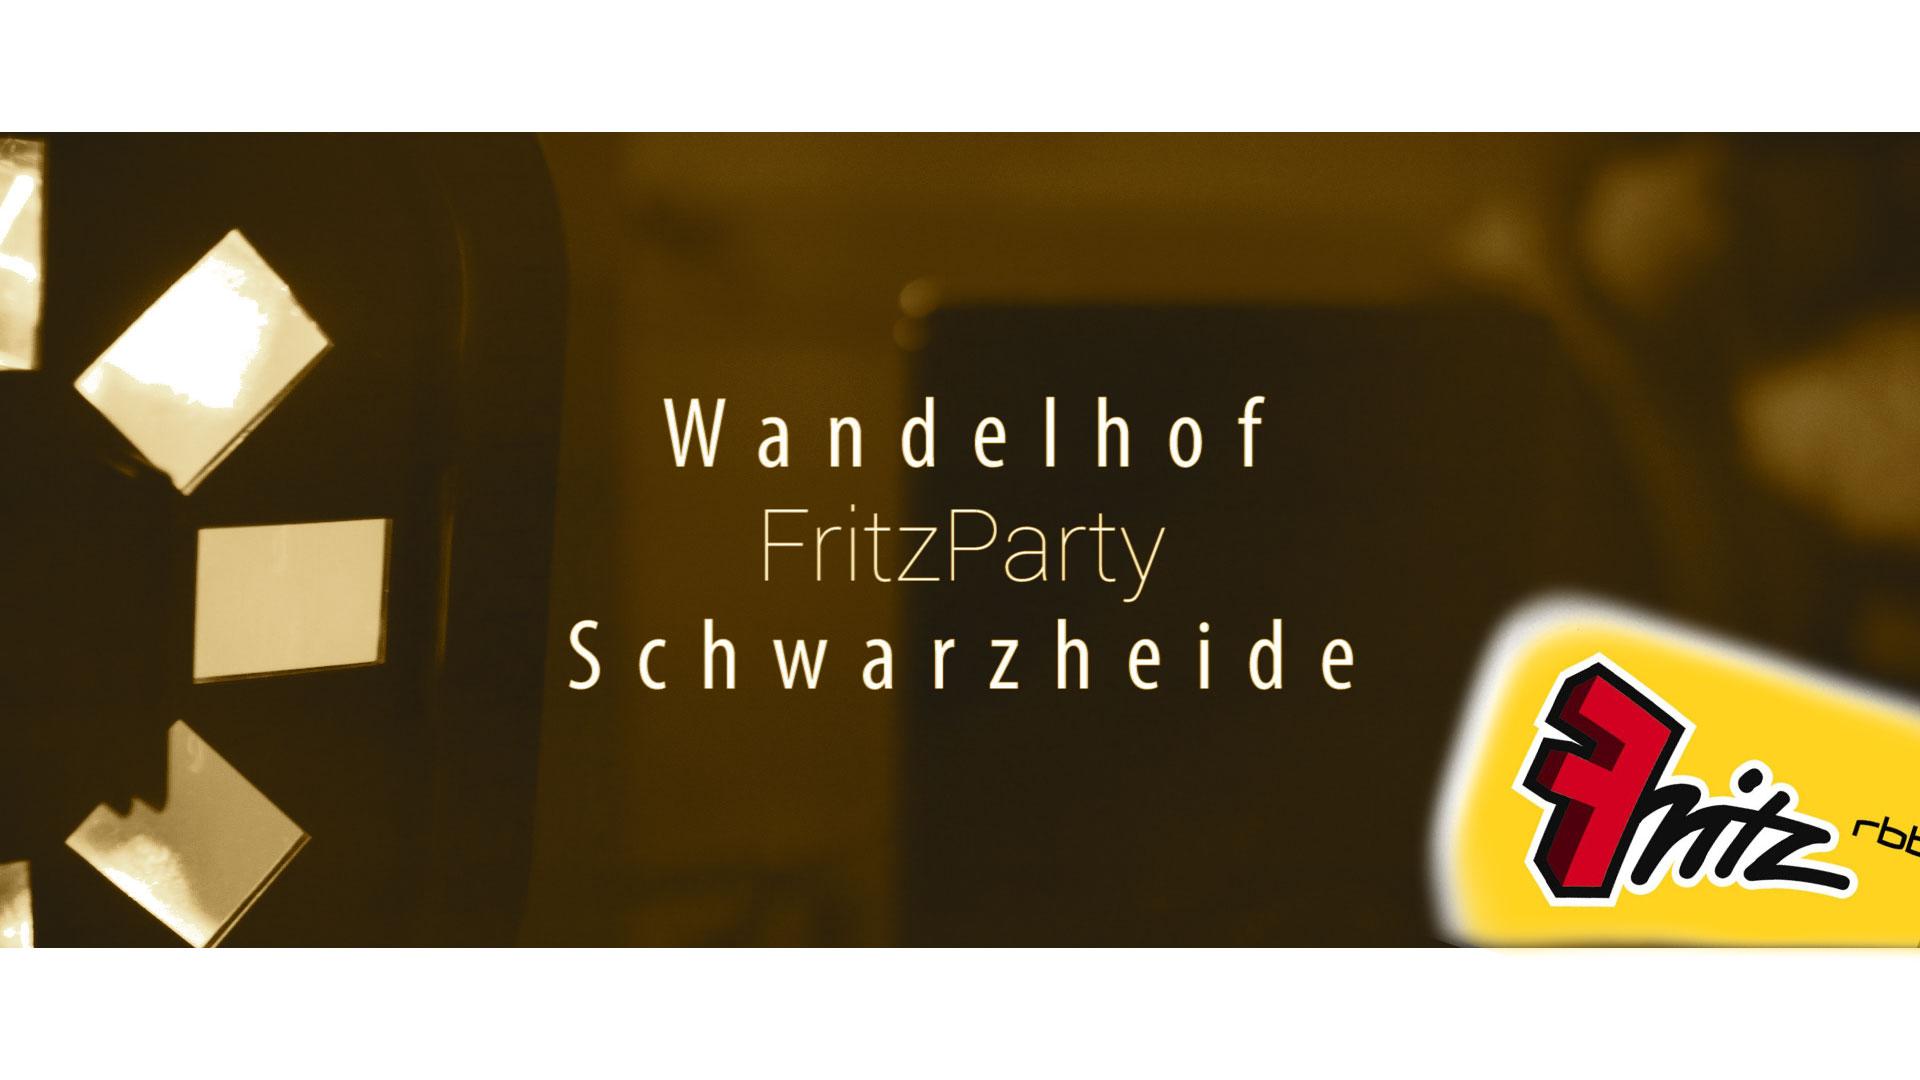 FritzParty Wandelhof Schwarzheide 2018